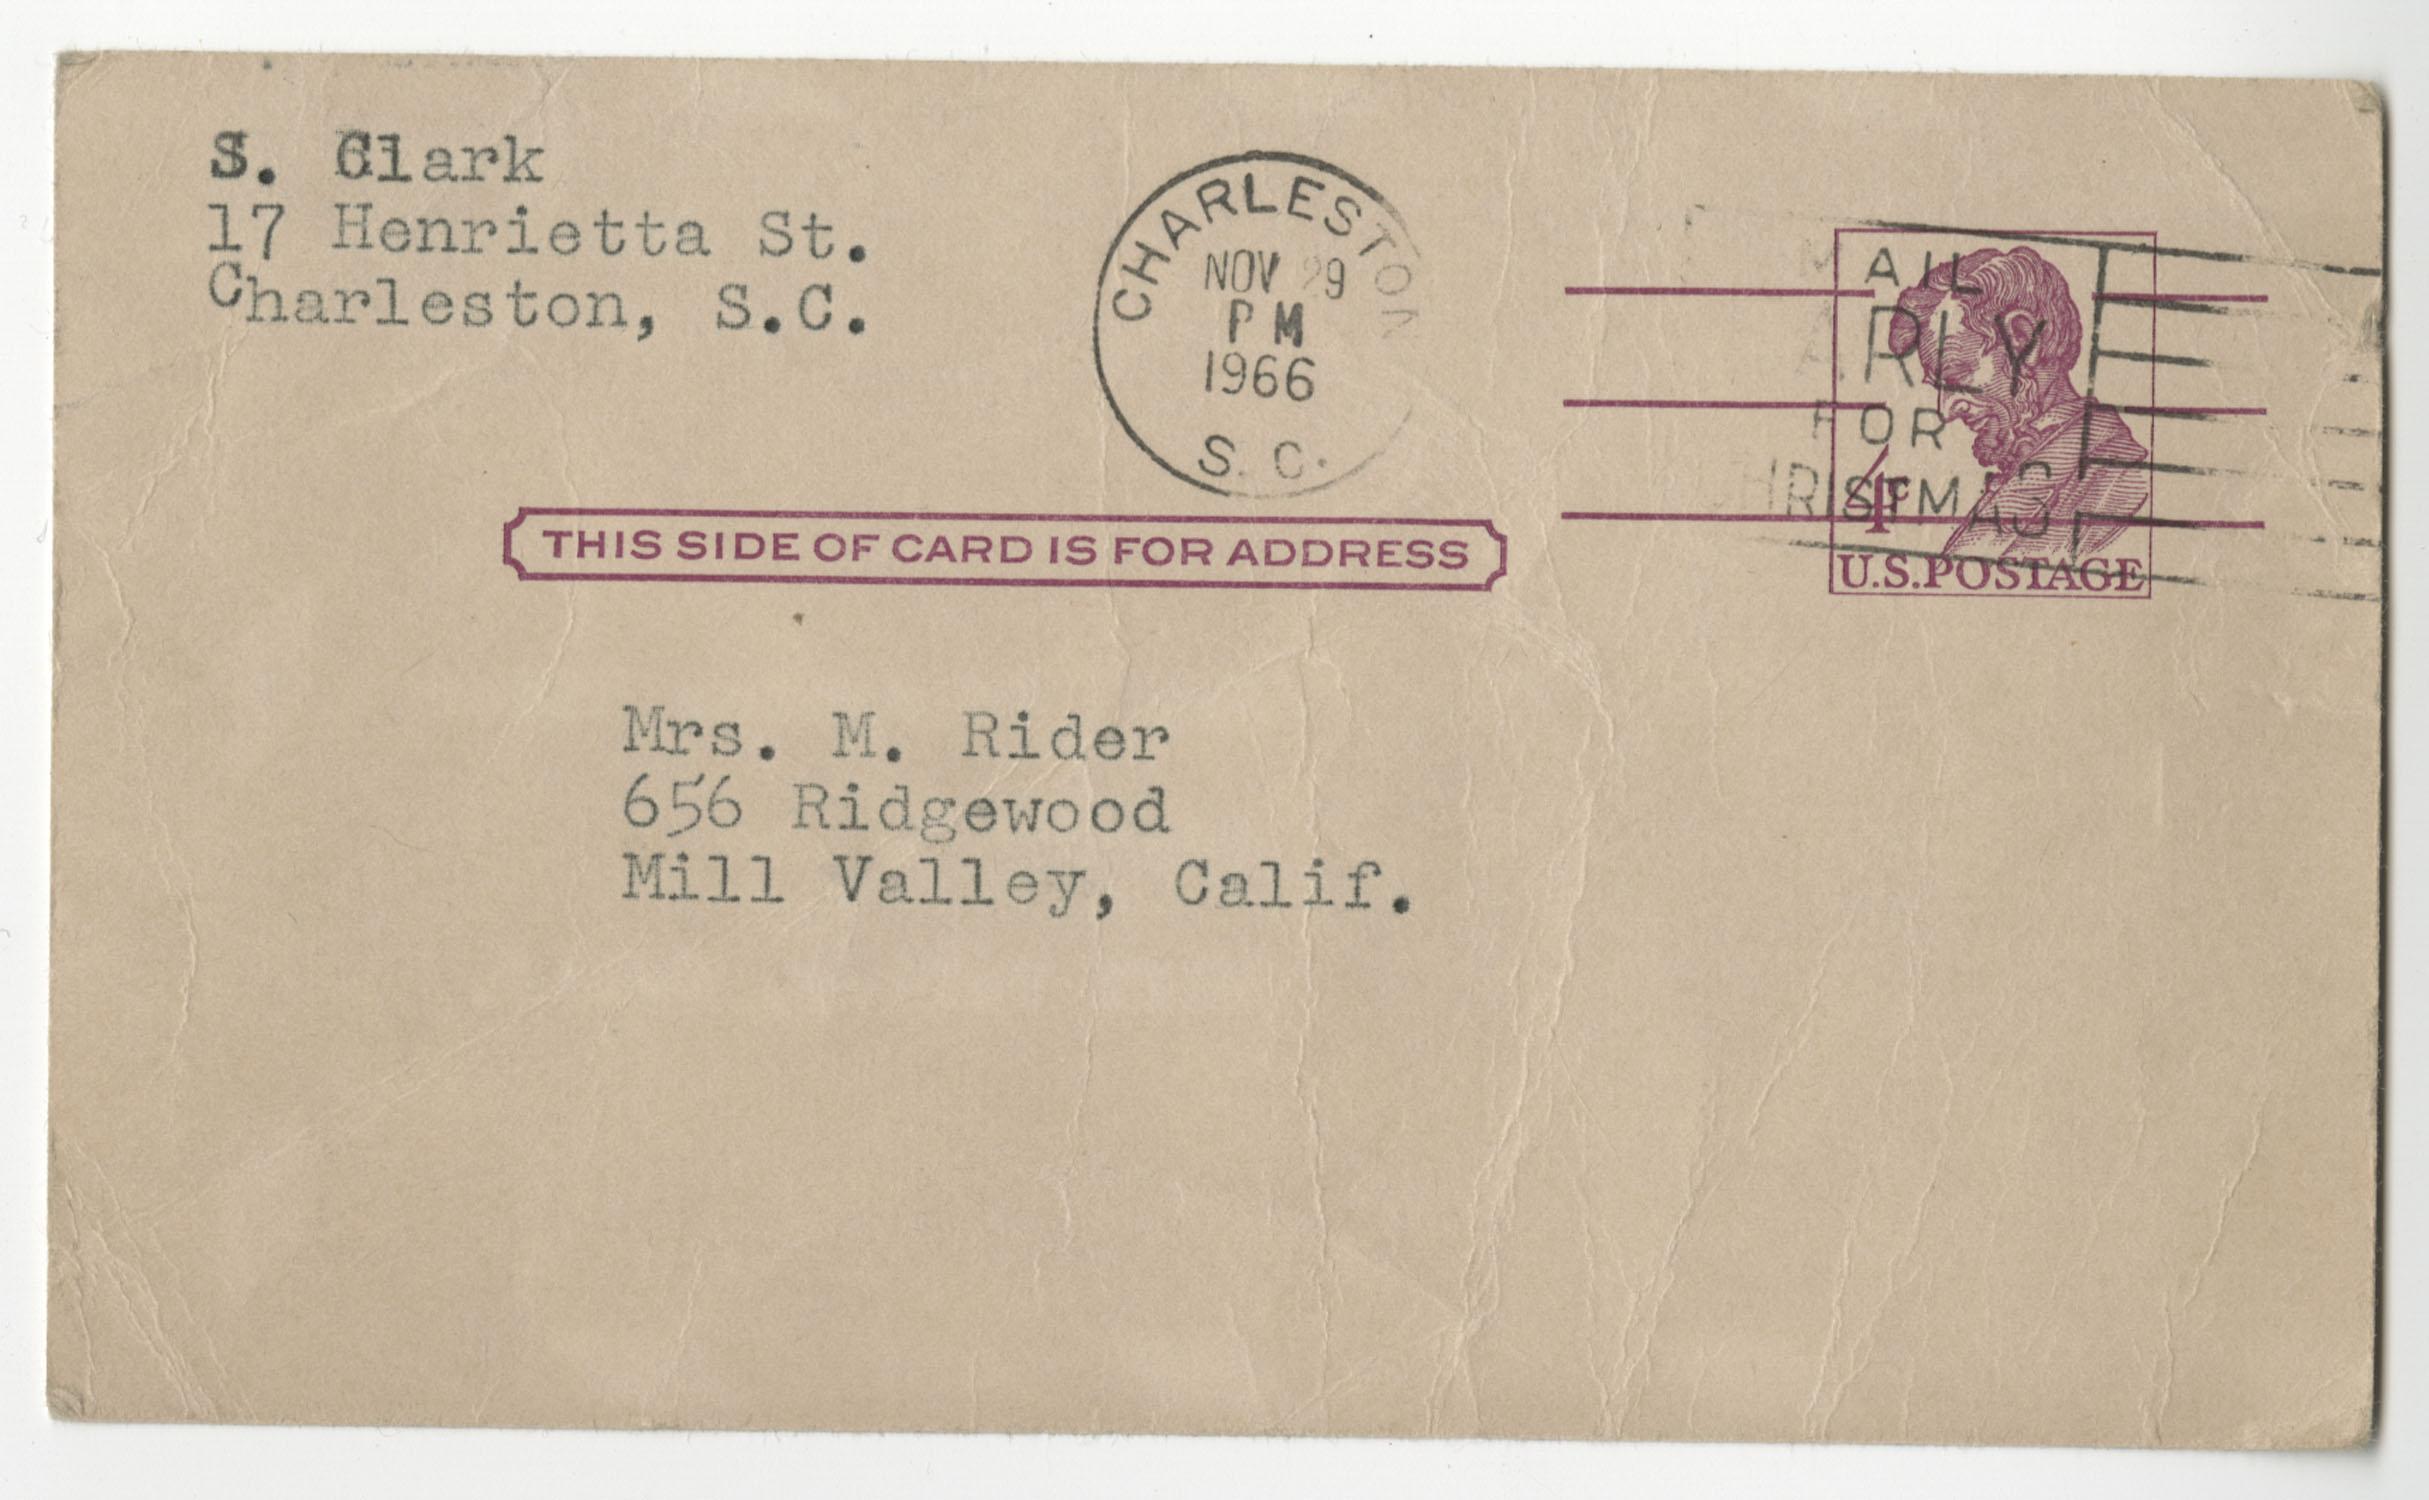 Letter from Septima P. Clark to Josephine Rider, November 28, 1966